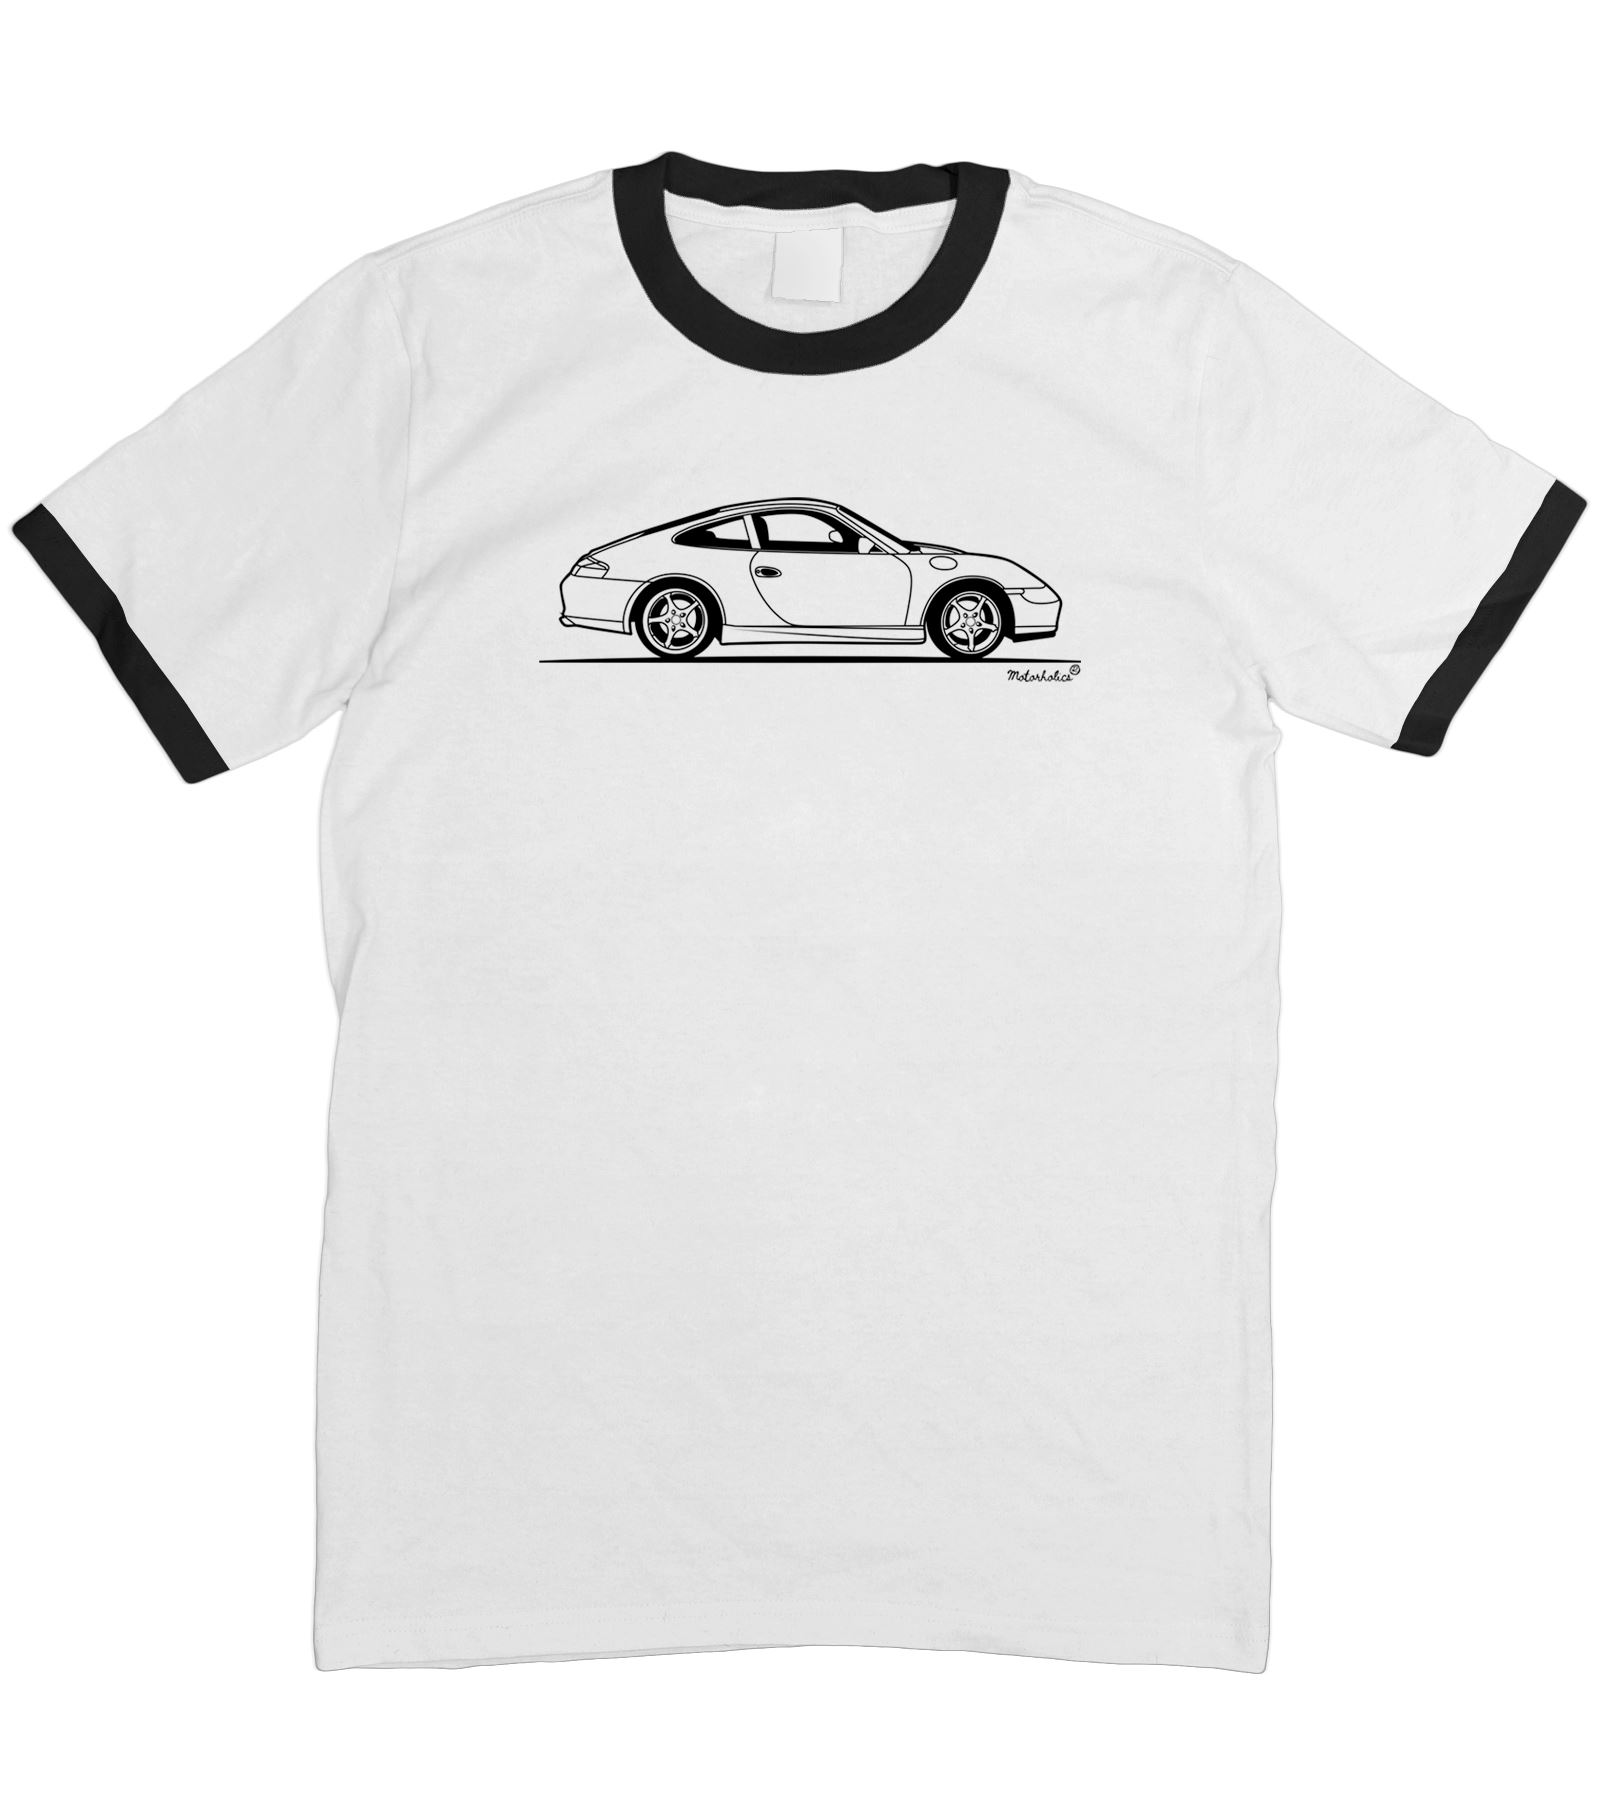 motorholics mens original sketch porsche 911 996 t shirt s. Black Bedroom Furniture Sets. Home Design Ideas